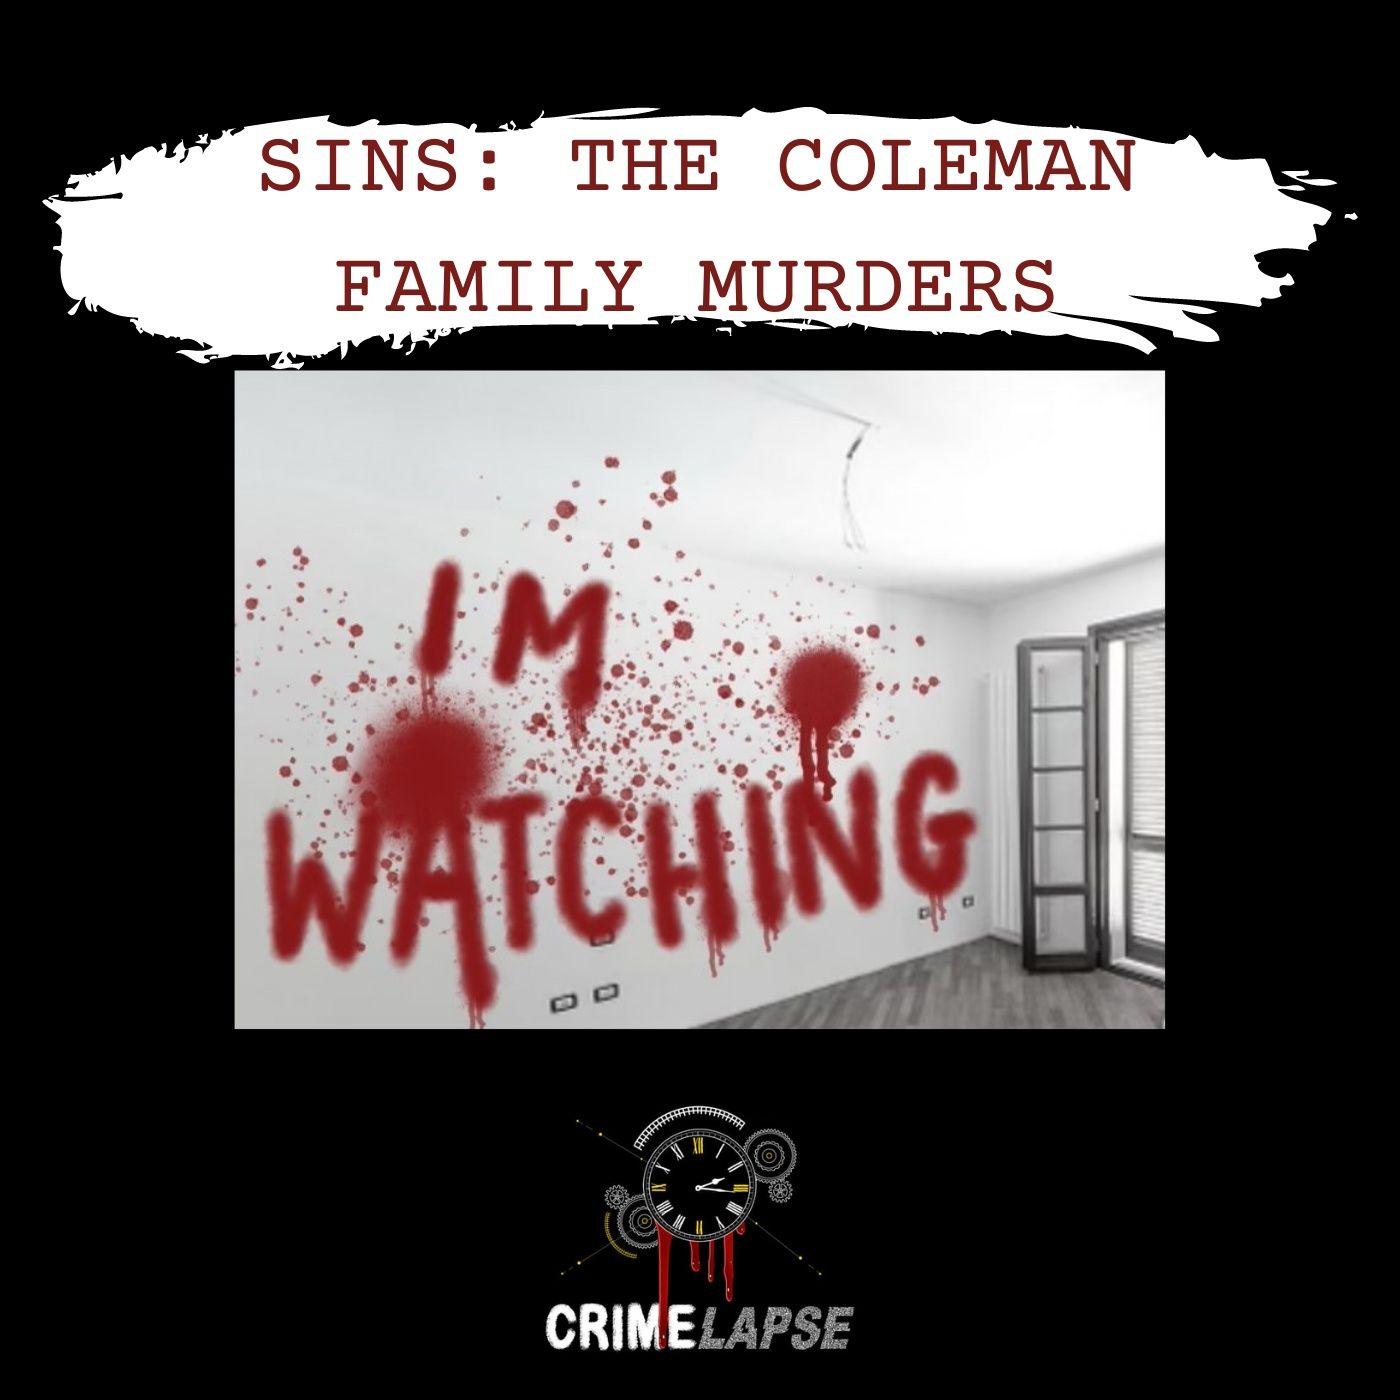 Sins: The Colemans